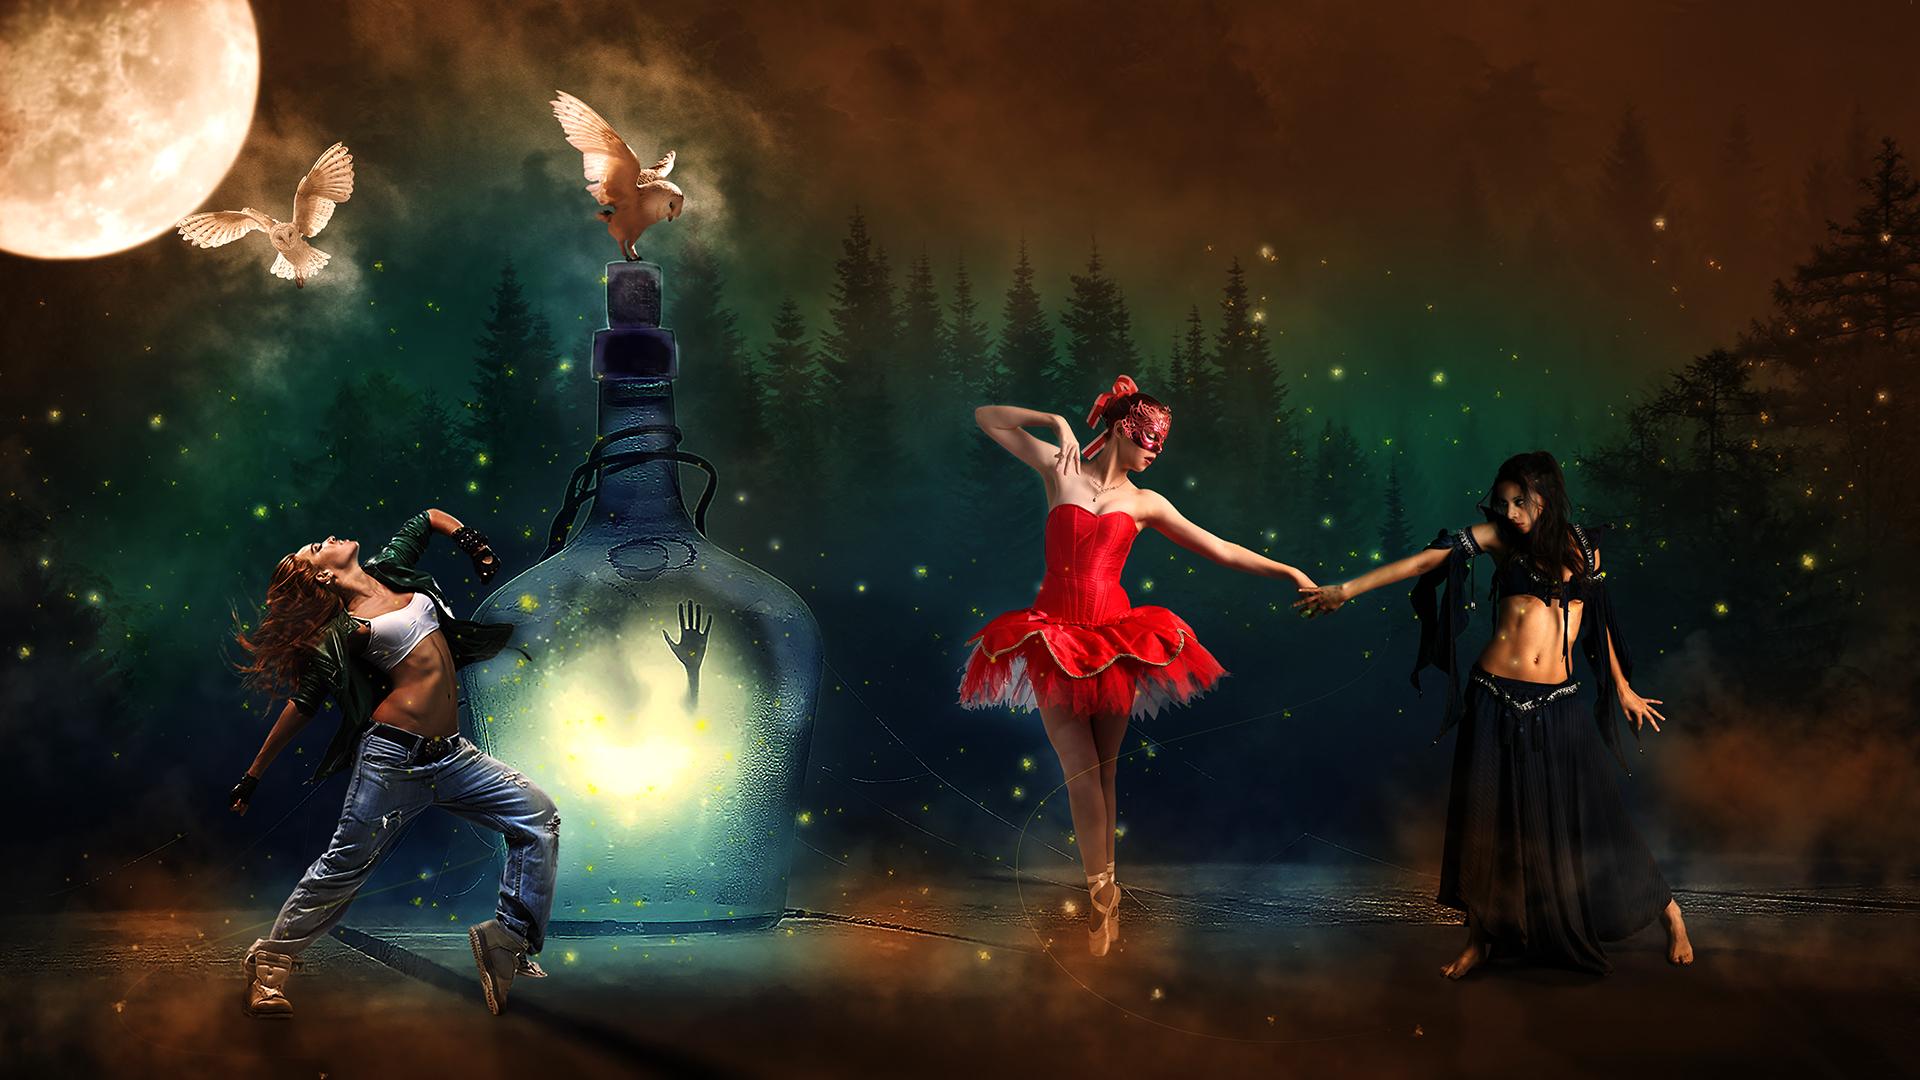 Firefly Sammer Dance